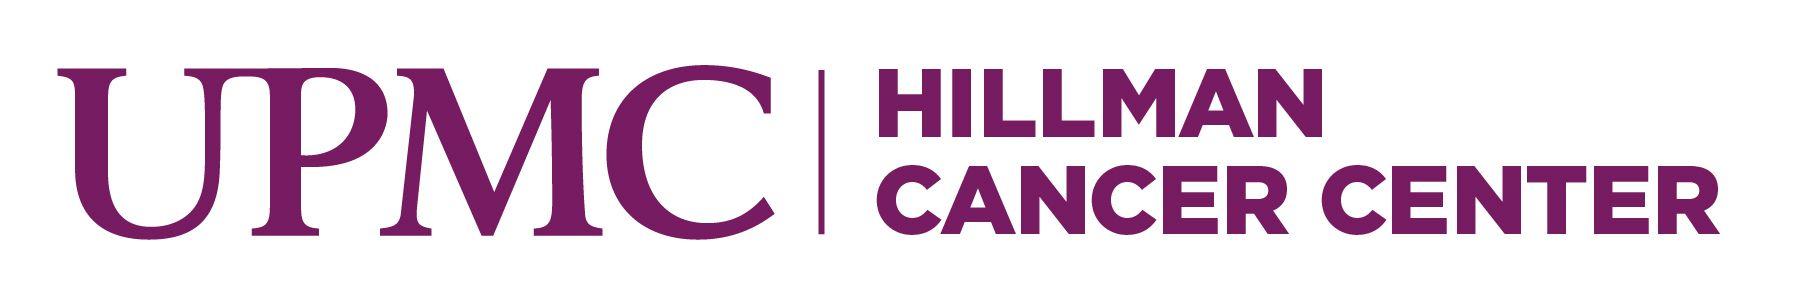 Partner | Cancer Centers | <b>UPMC Hillman Cancer Center</b>